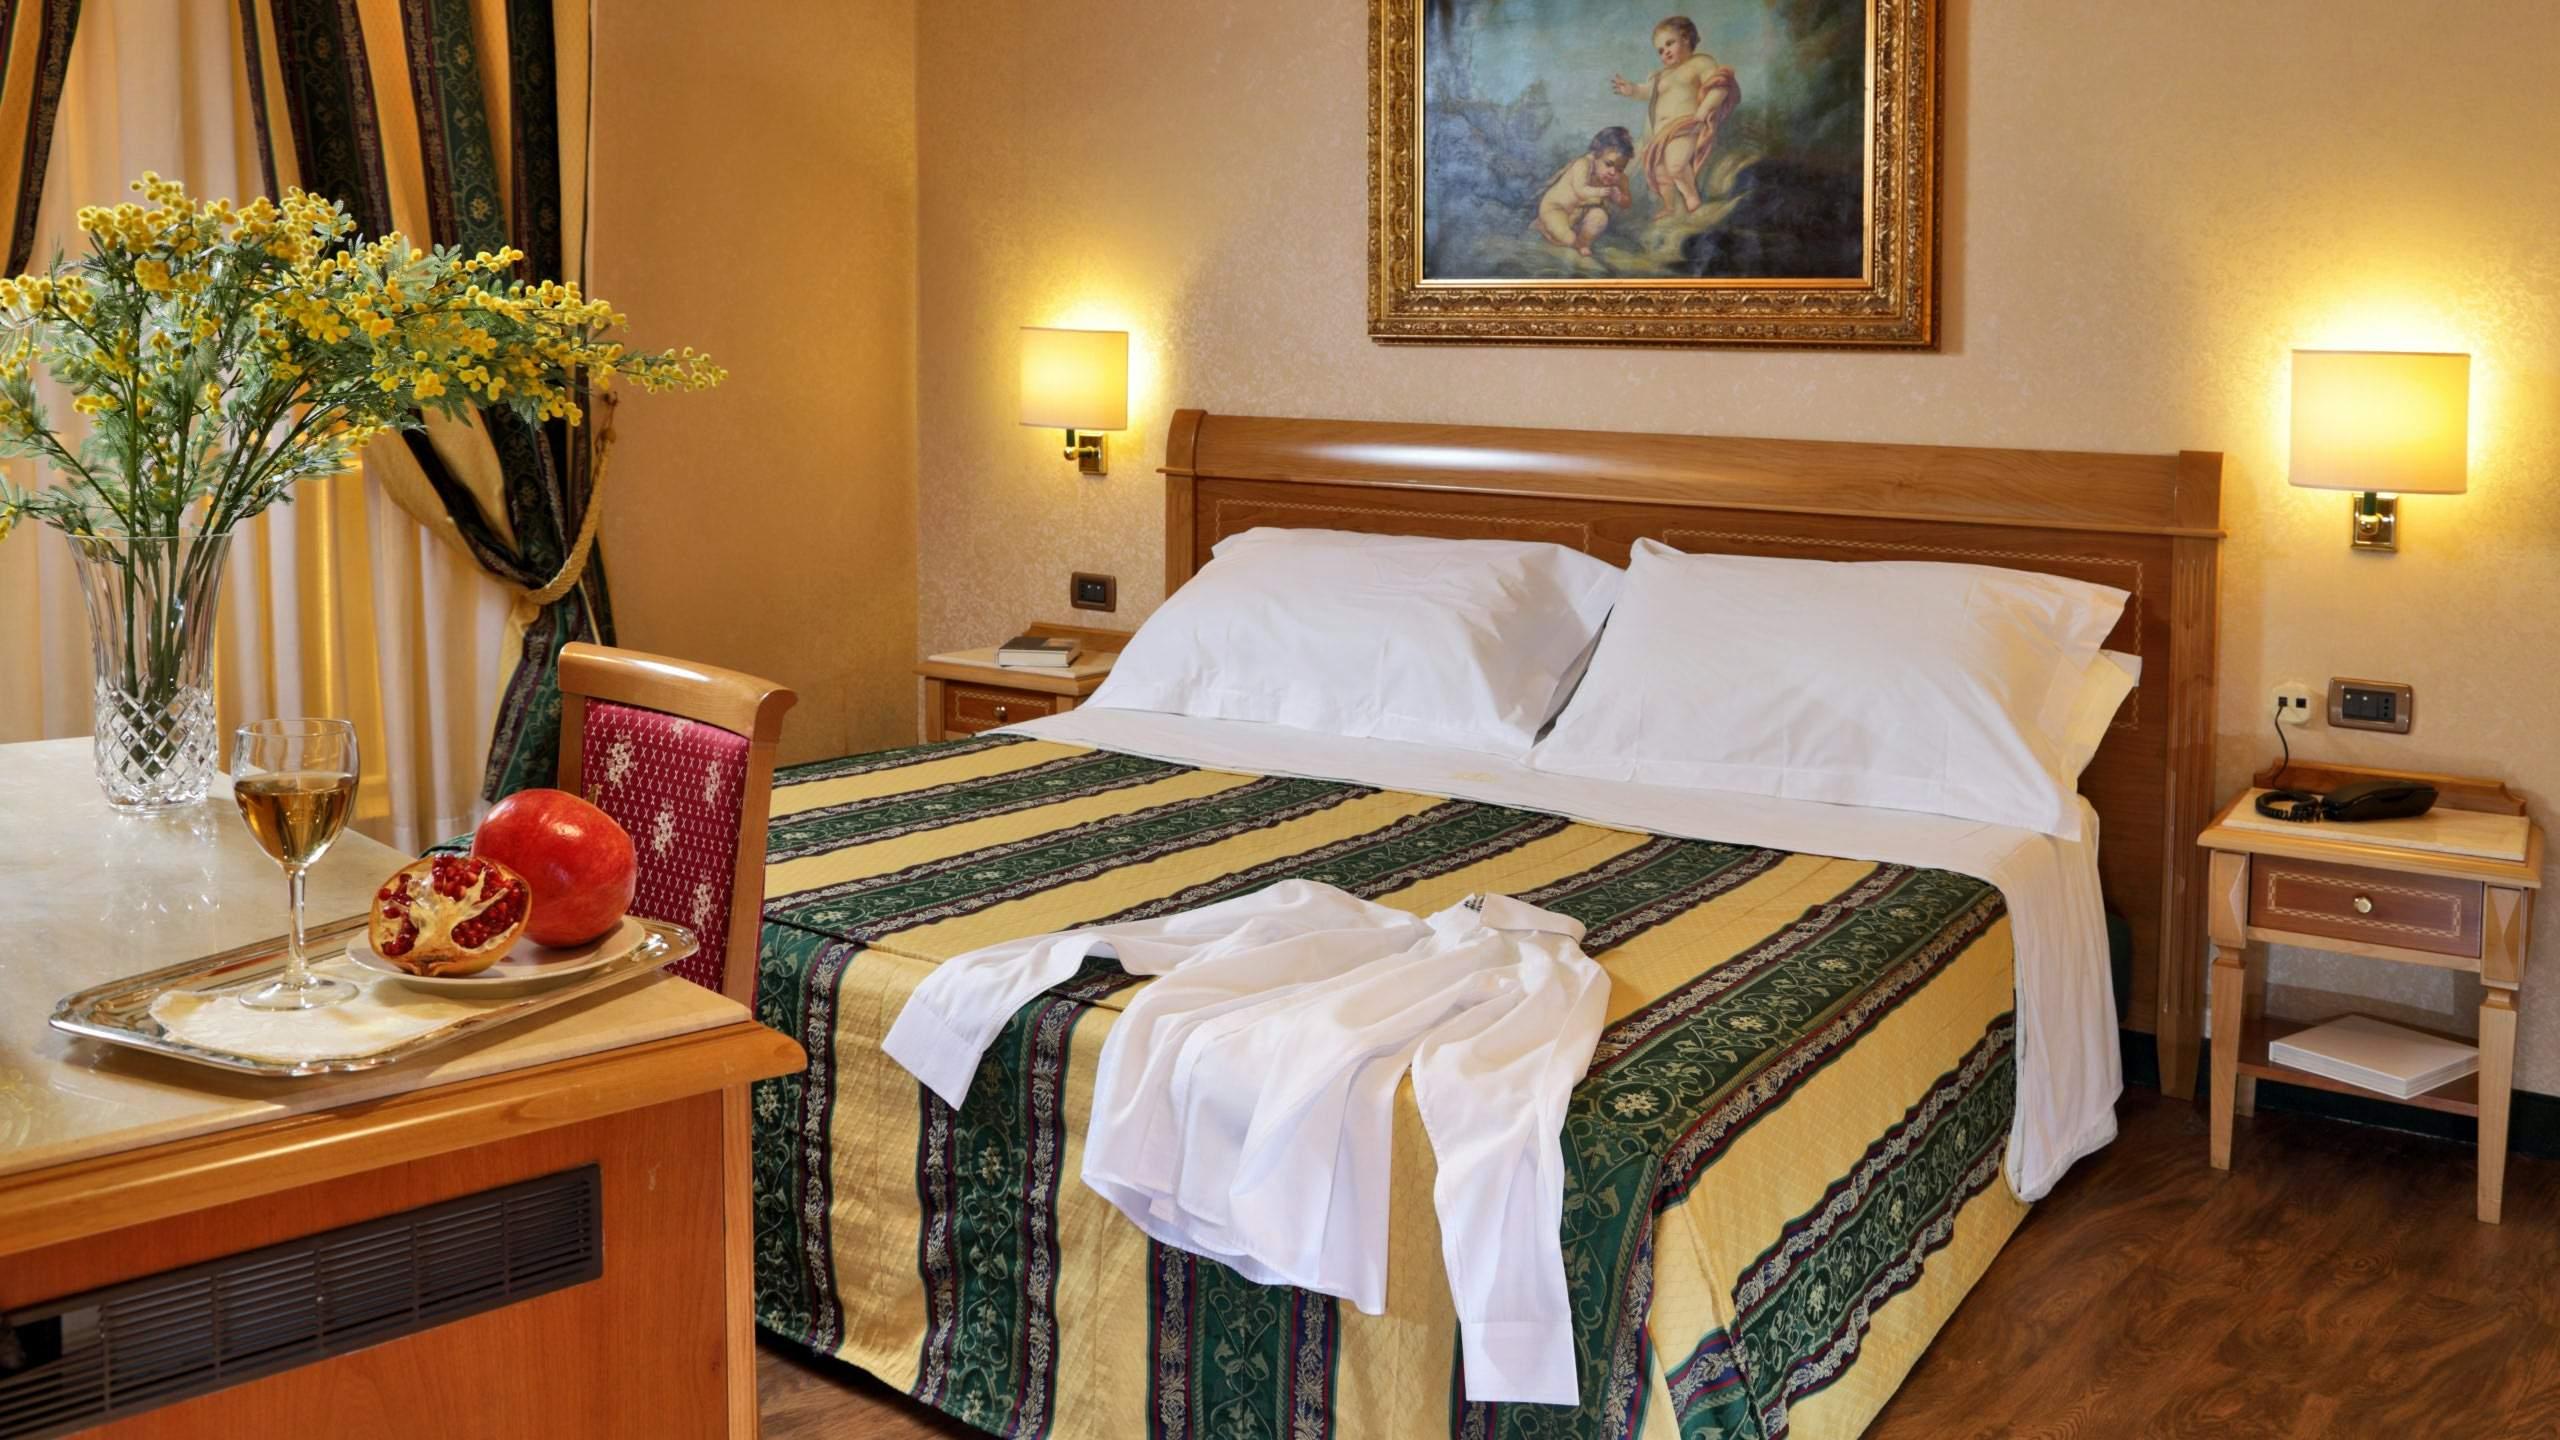 Hotel-Colonna-Frascati-room